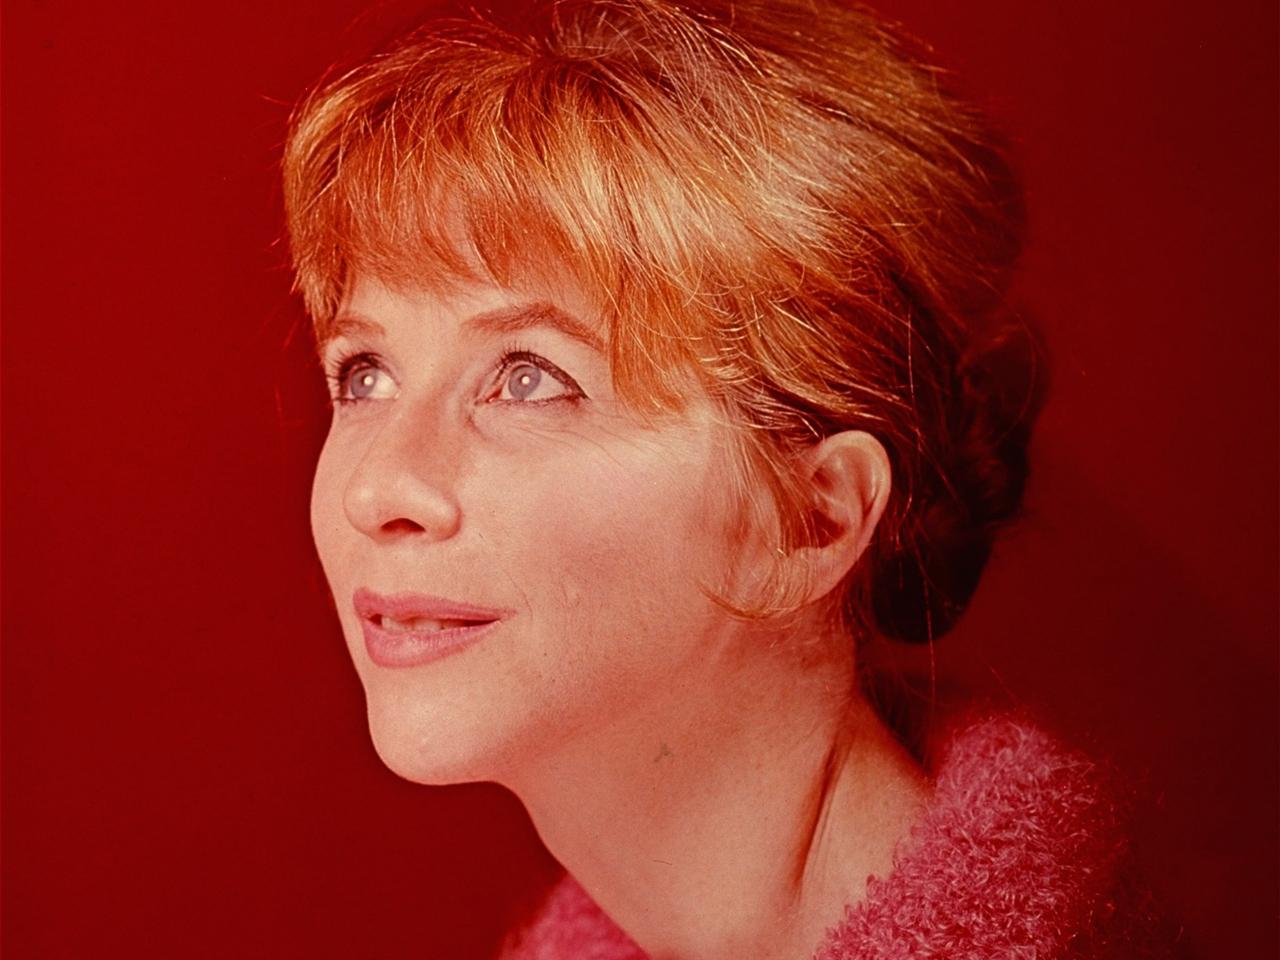 Actress Julie Harris is shown in this 1965 portrait. (AP Photo)